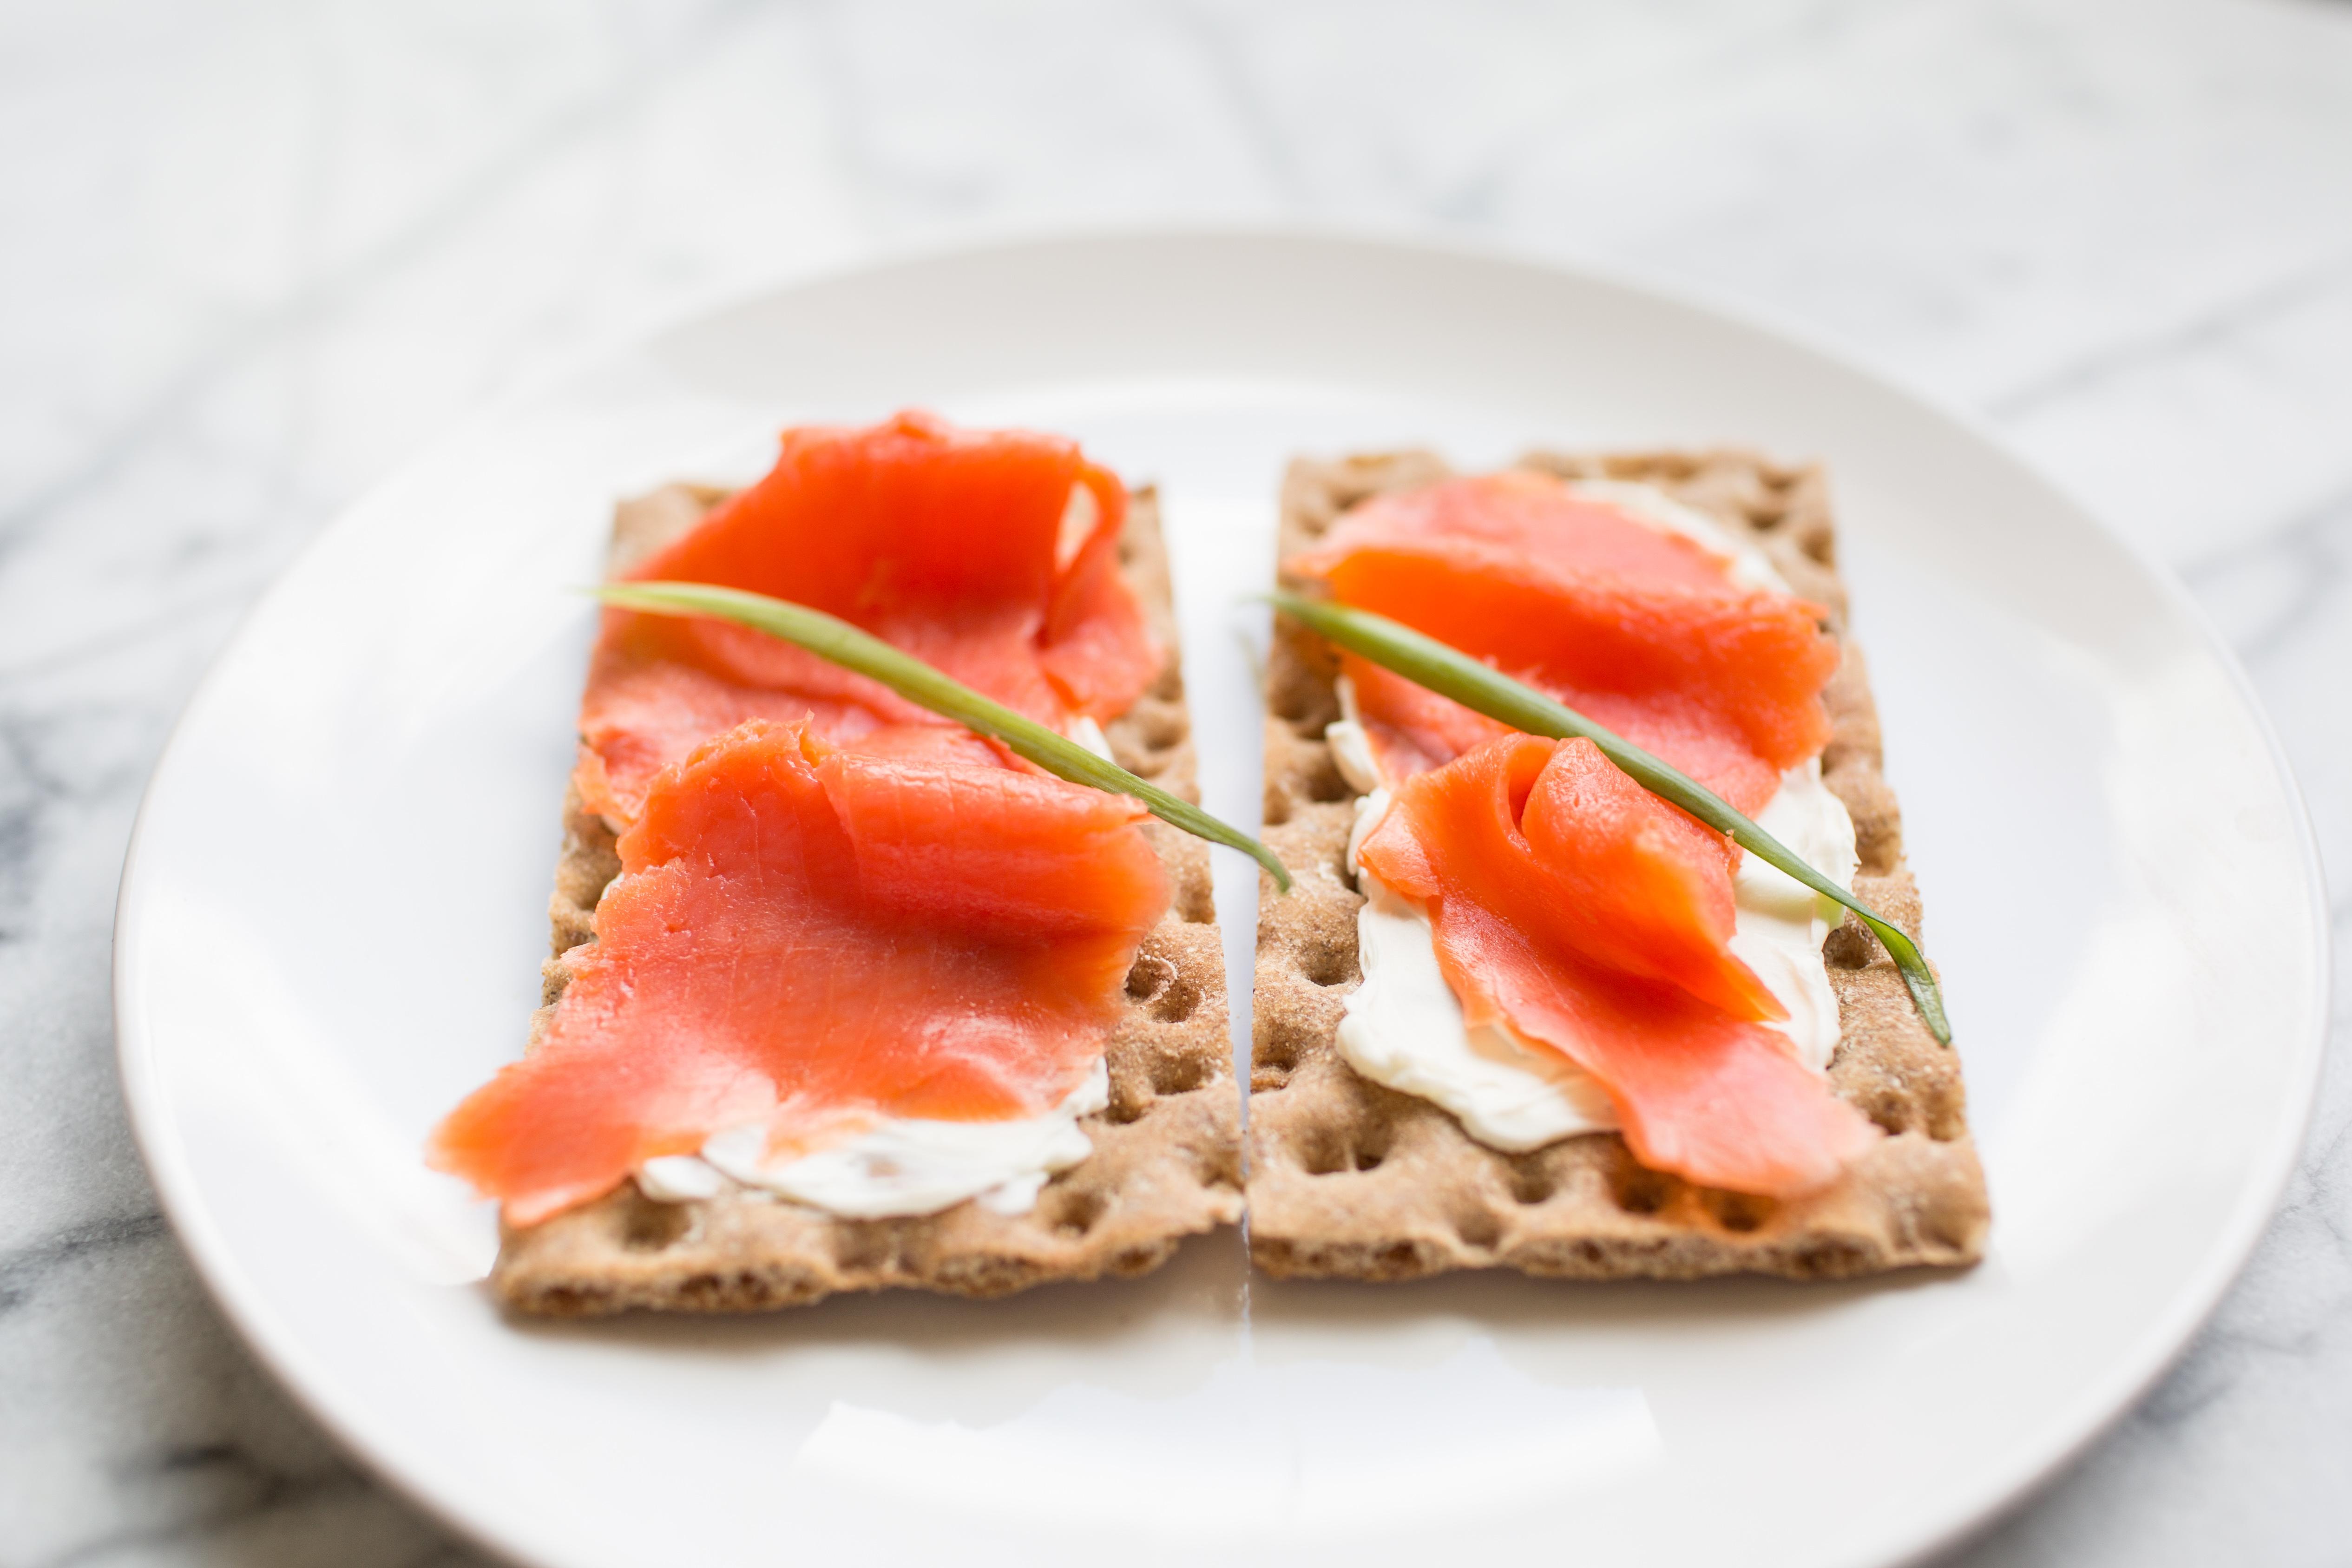 Smoked Salmon on Wasa Crackers